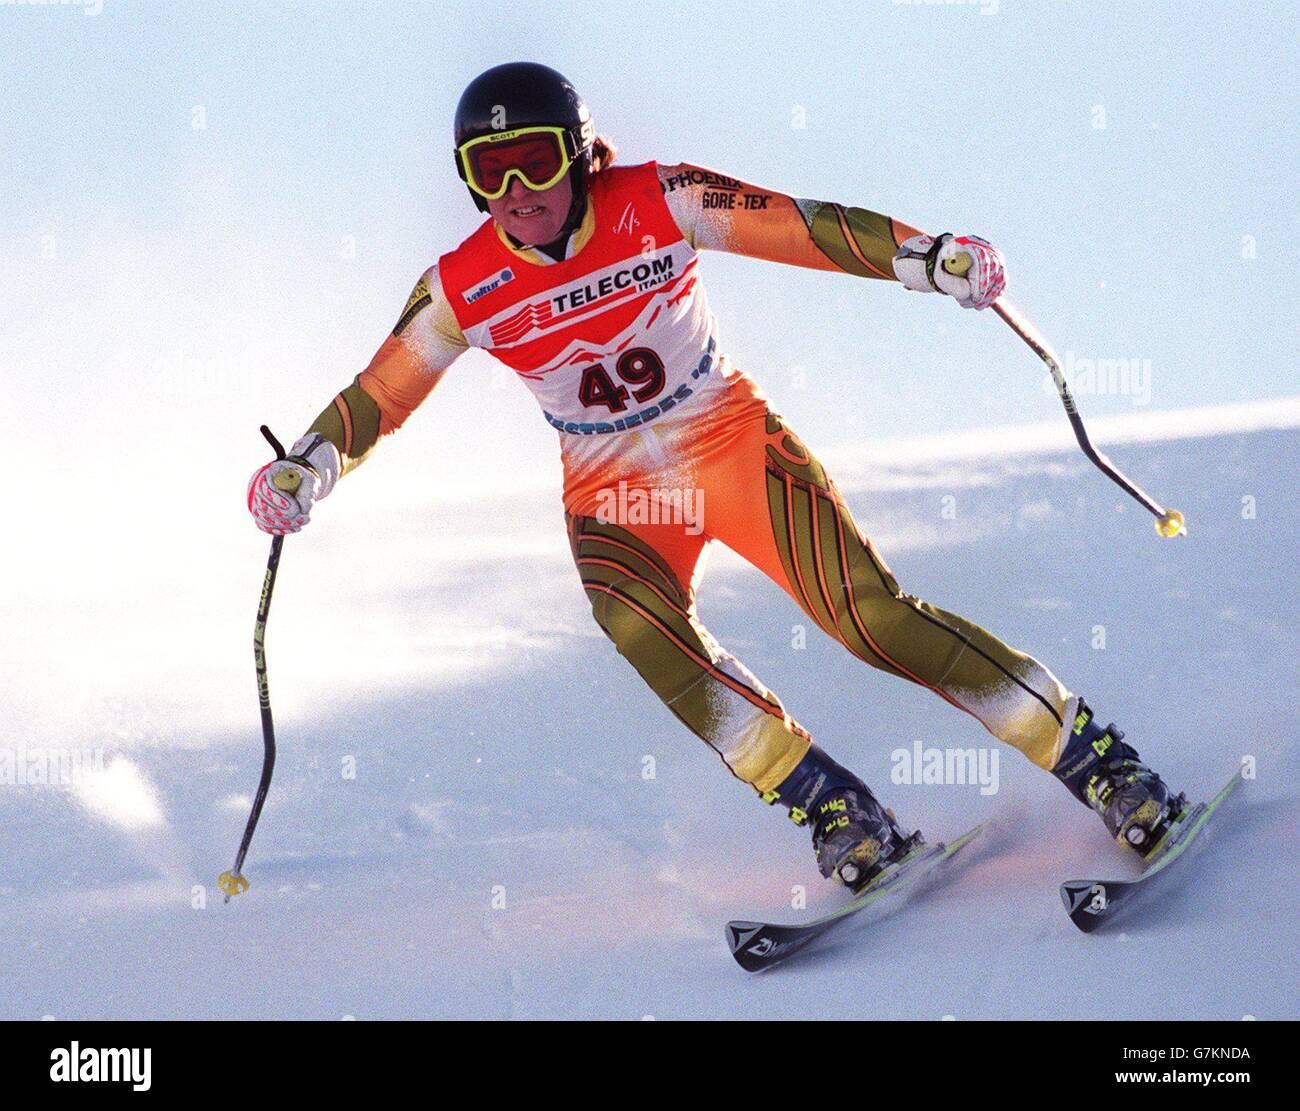 Skiing - Alpine World Ski Championships - 7th Giant Slalom Men - Sestrieres 97 - Stock Image